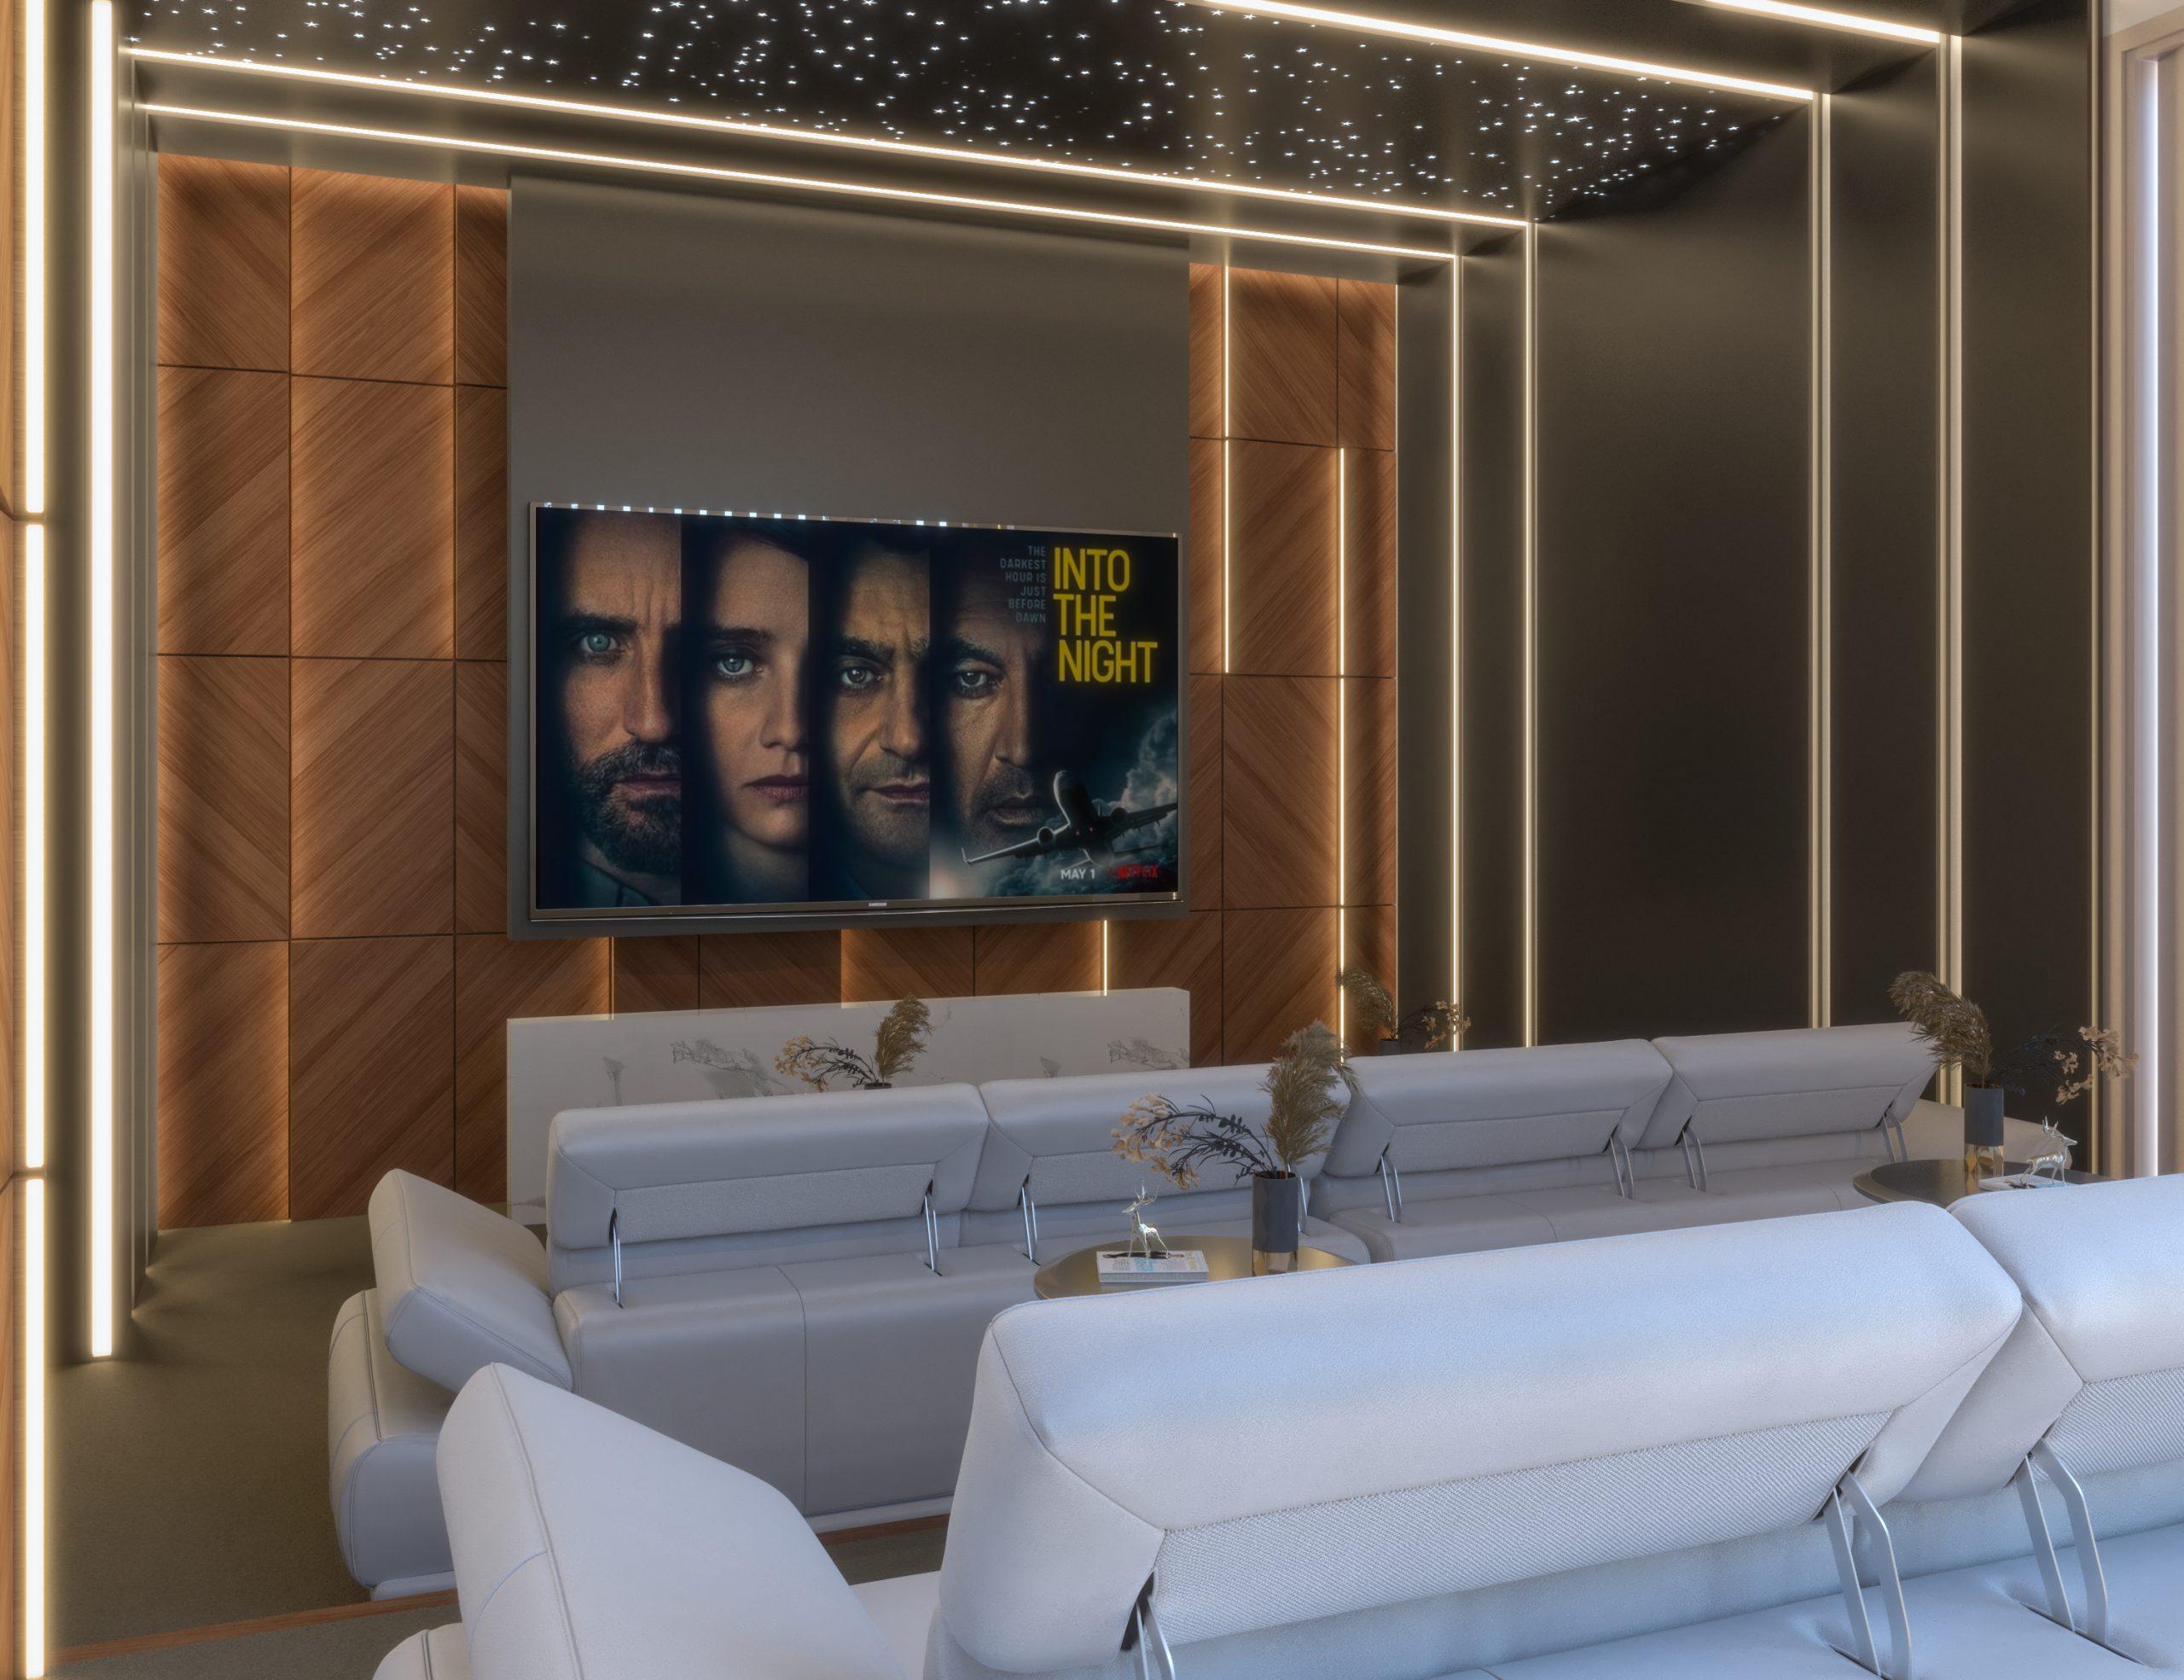 front view - big cinema screen - wooden design